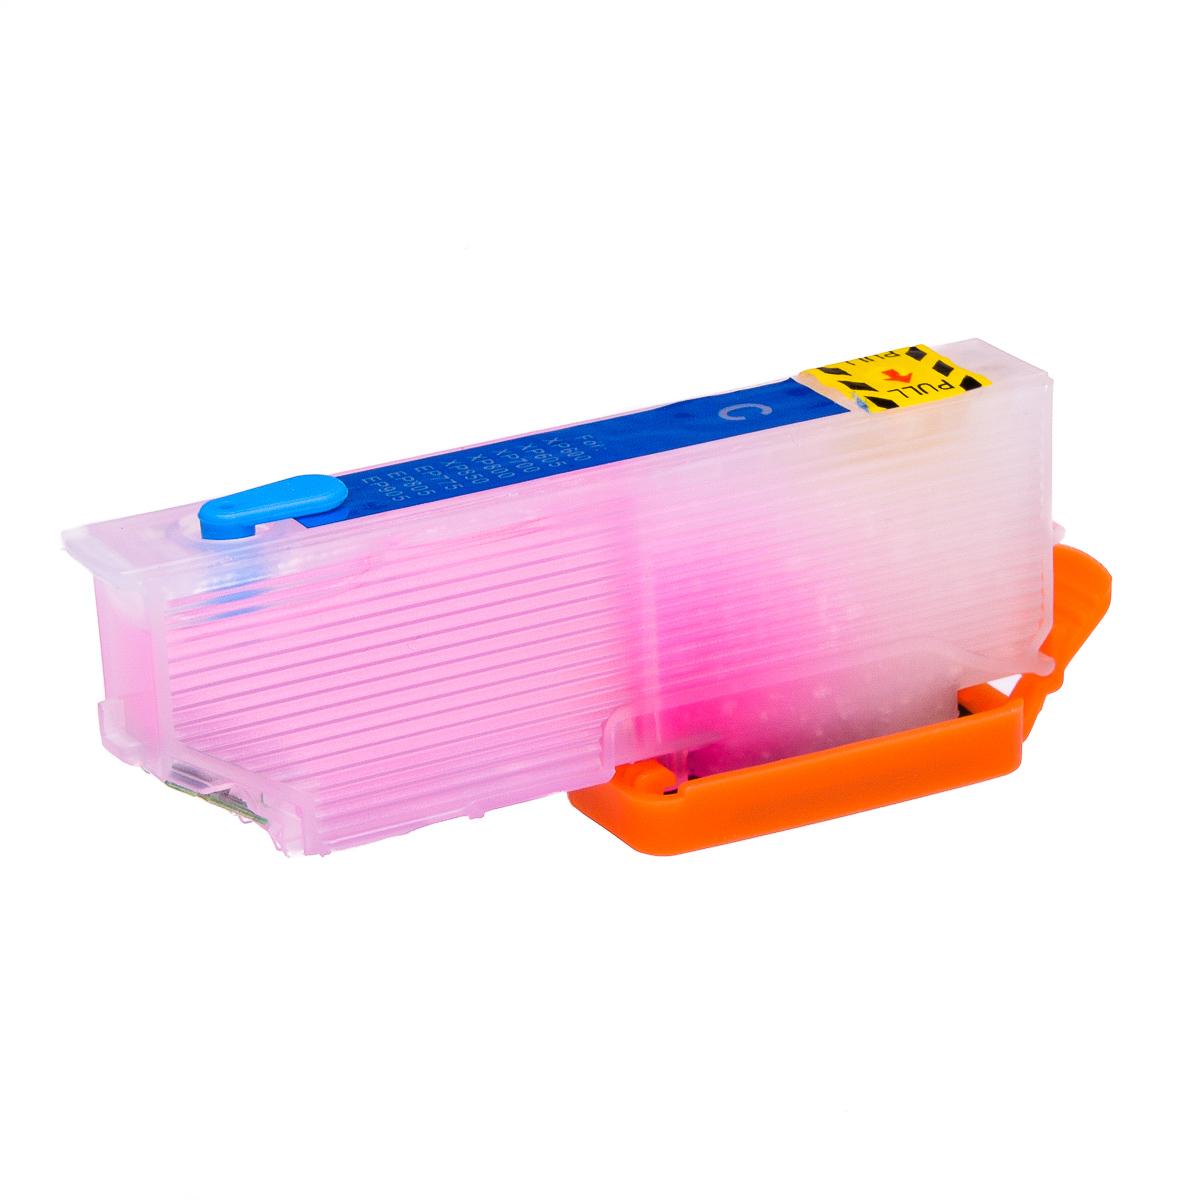 Cyan printhead cleaning cartridge for Epson XP-55 printer